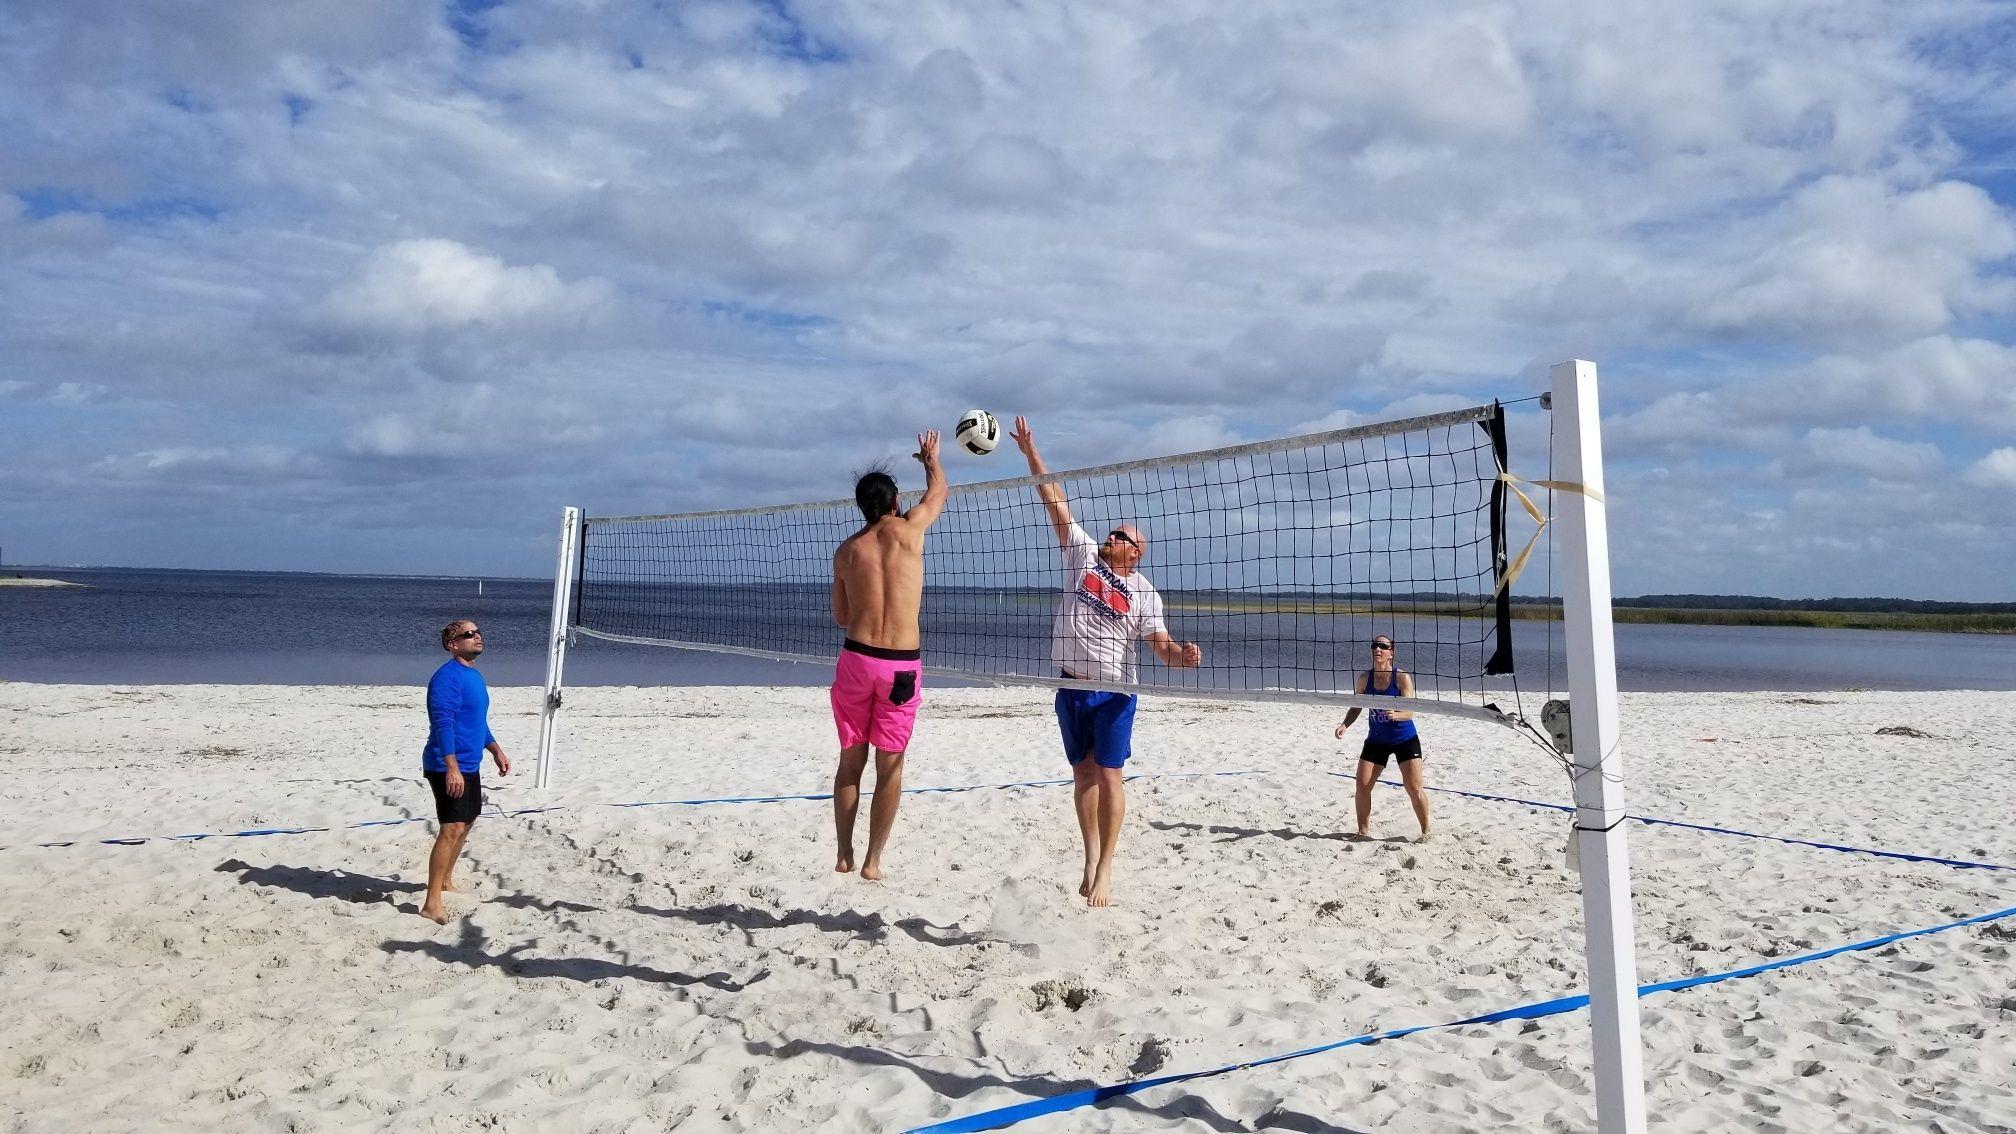 Volleyball addicts